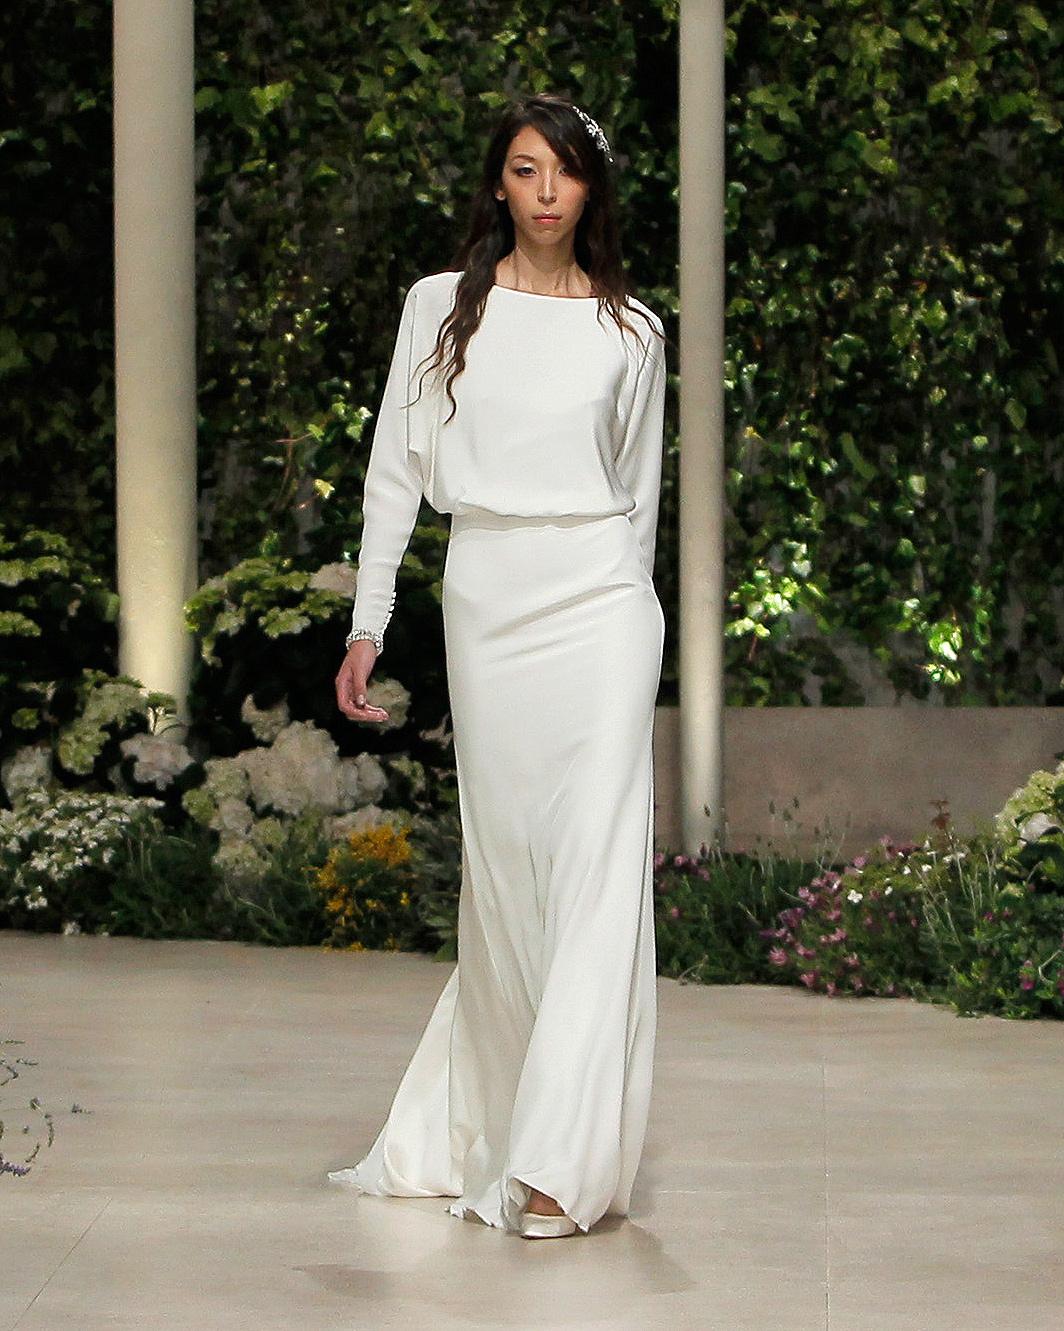 pronovias wedding dress spring 2019 long sleeve bateau neck